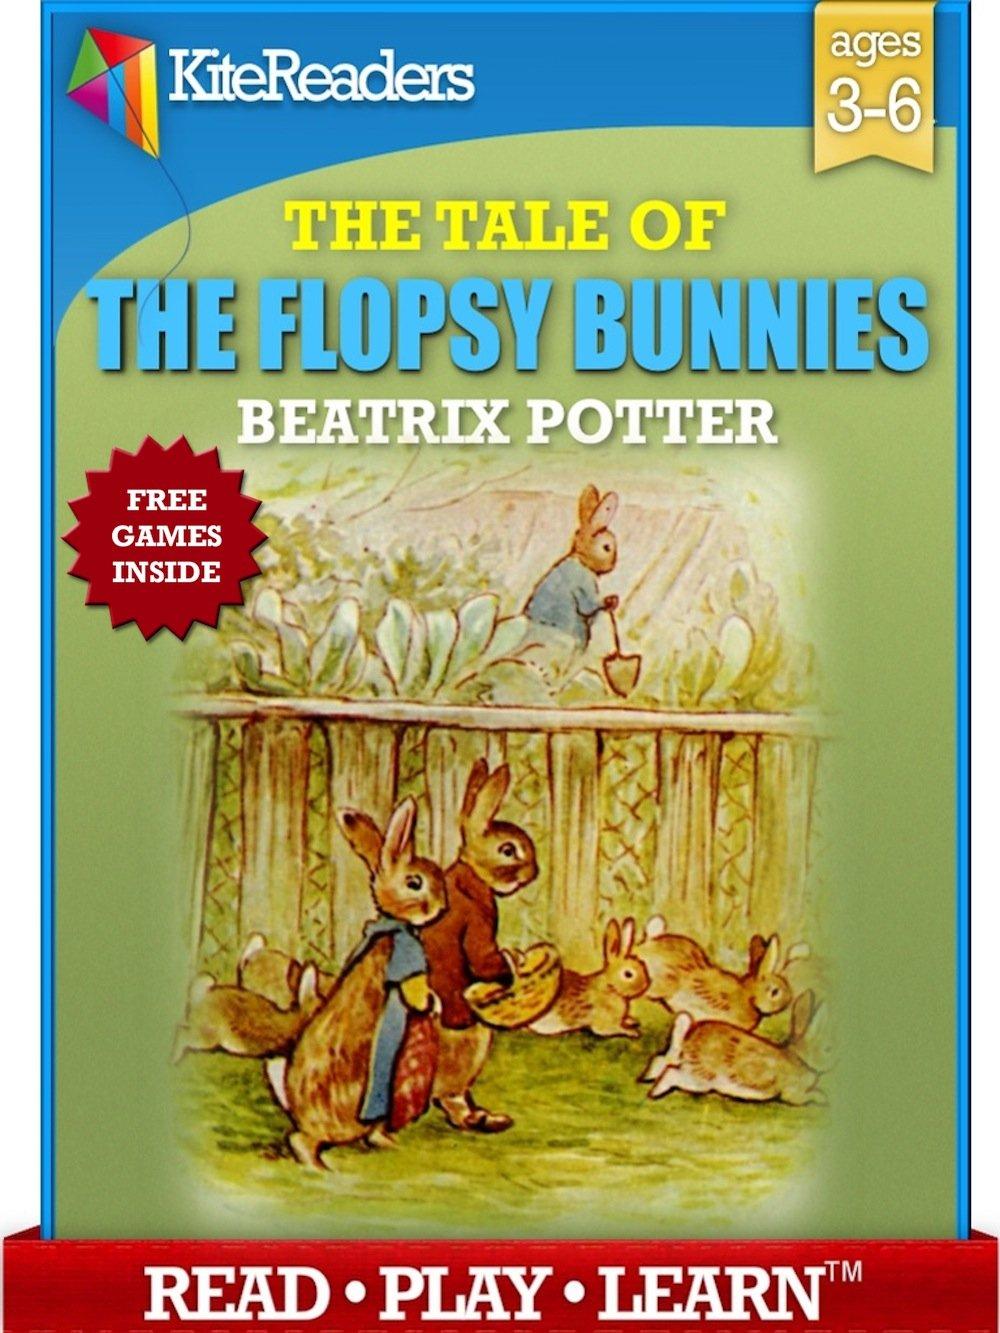 Learning Read Bunnies Read-play-learn